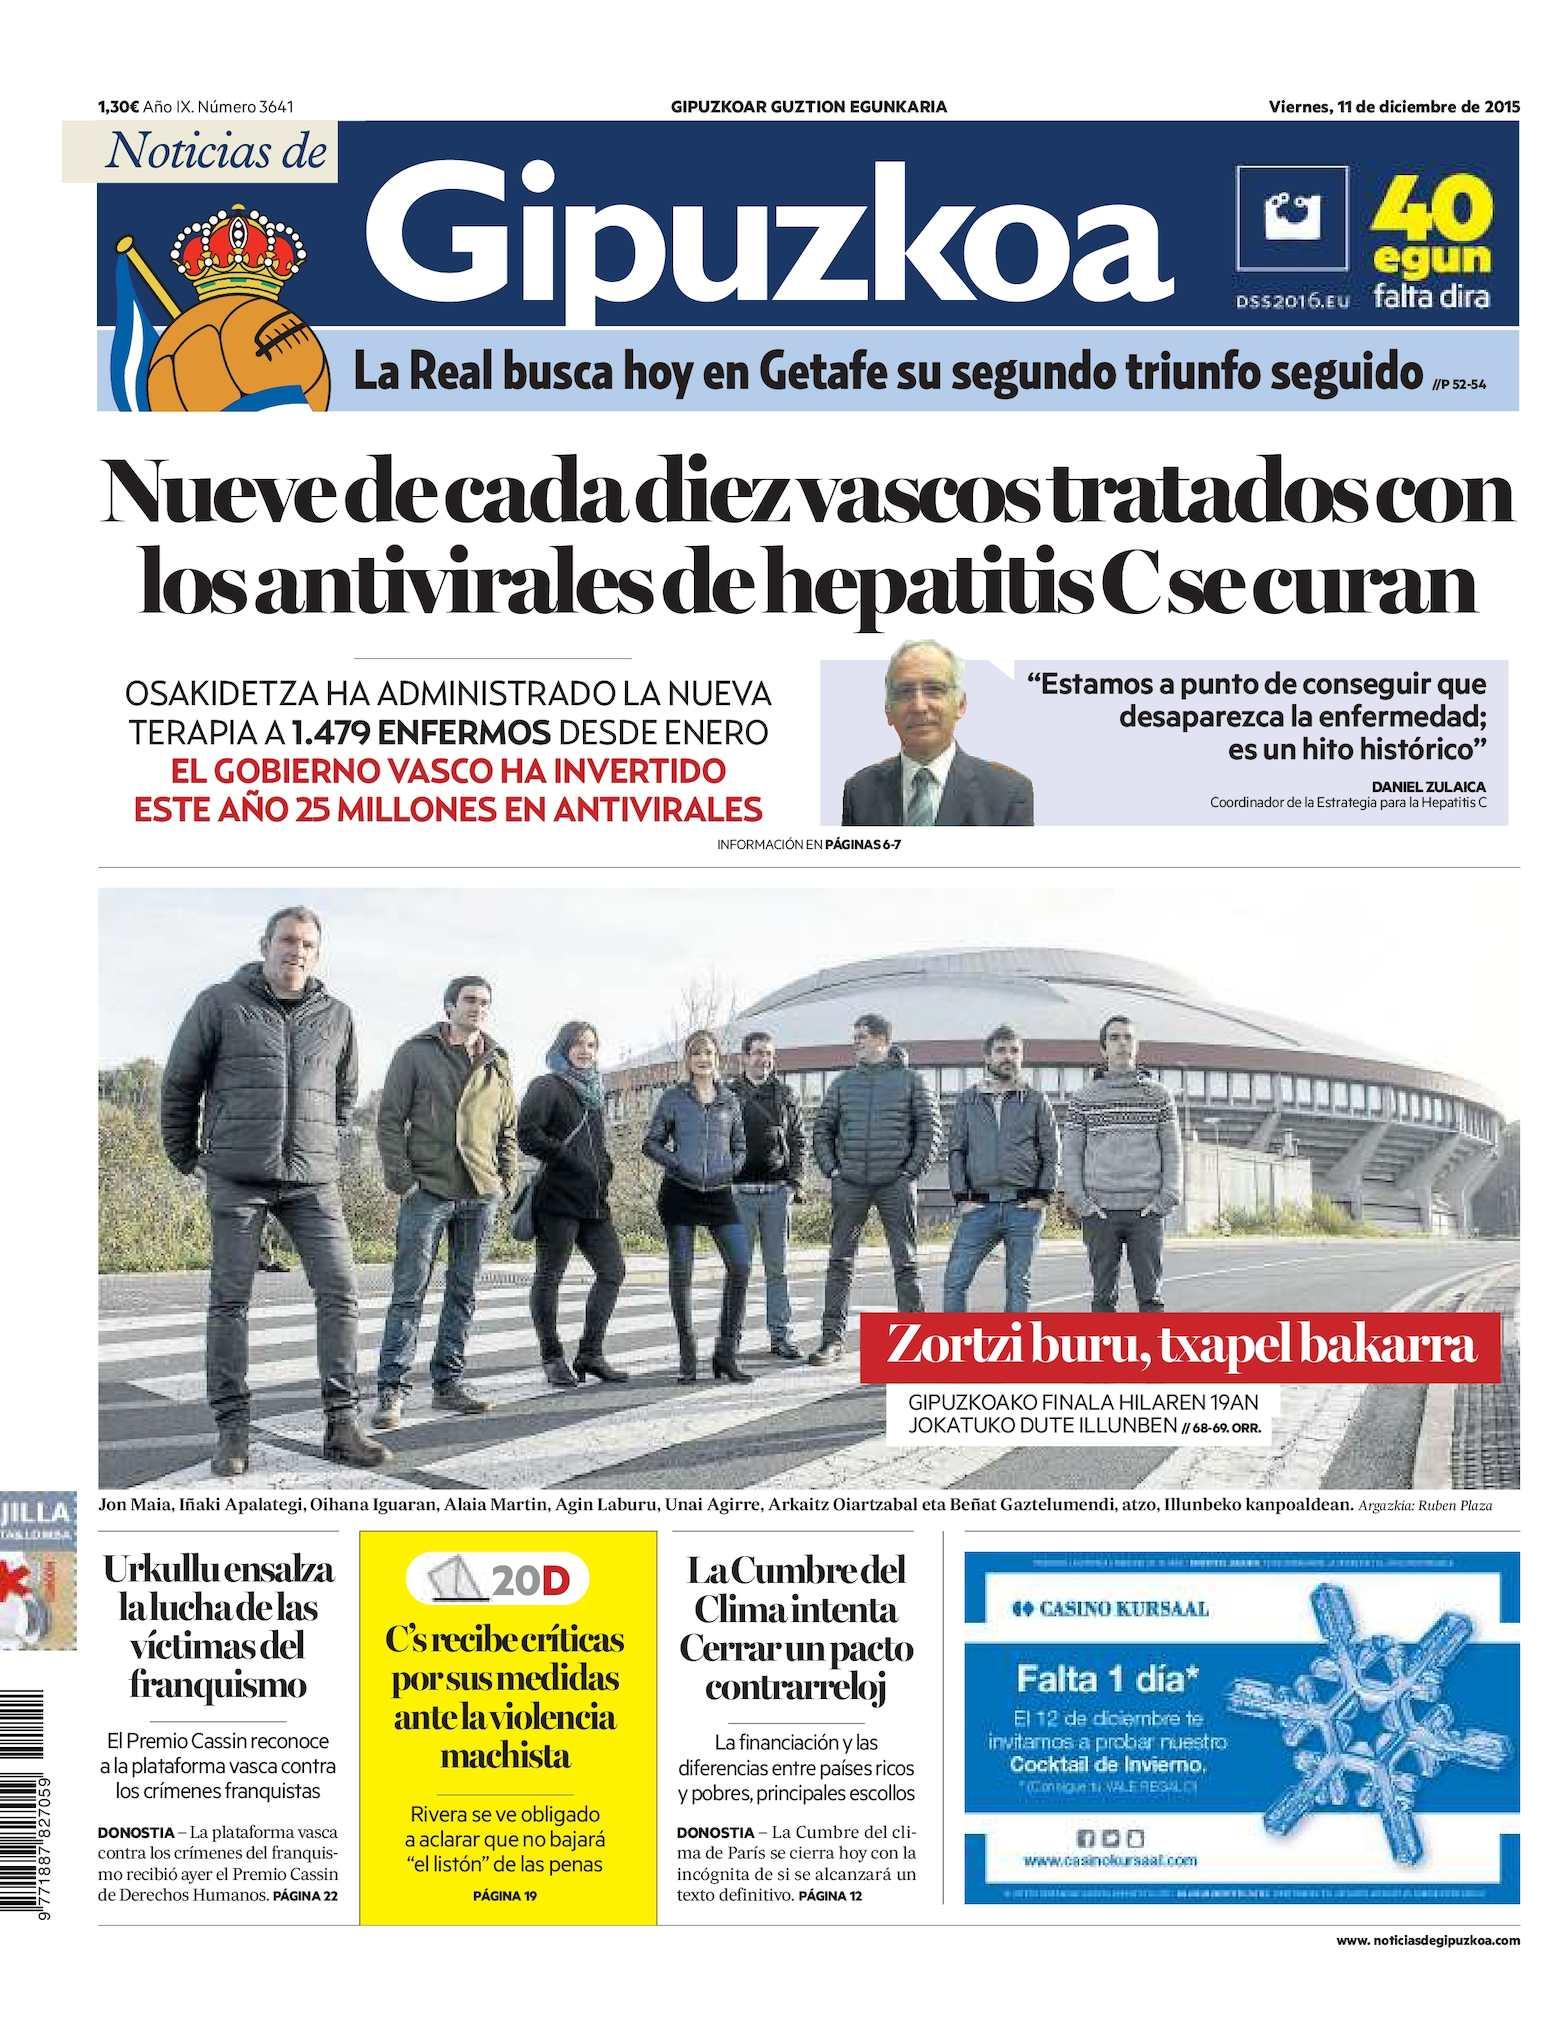 Ruleta gratis con premios comprar loteria euromillones en Braga-285948